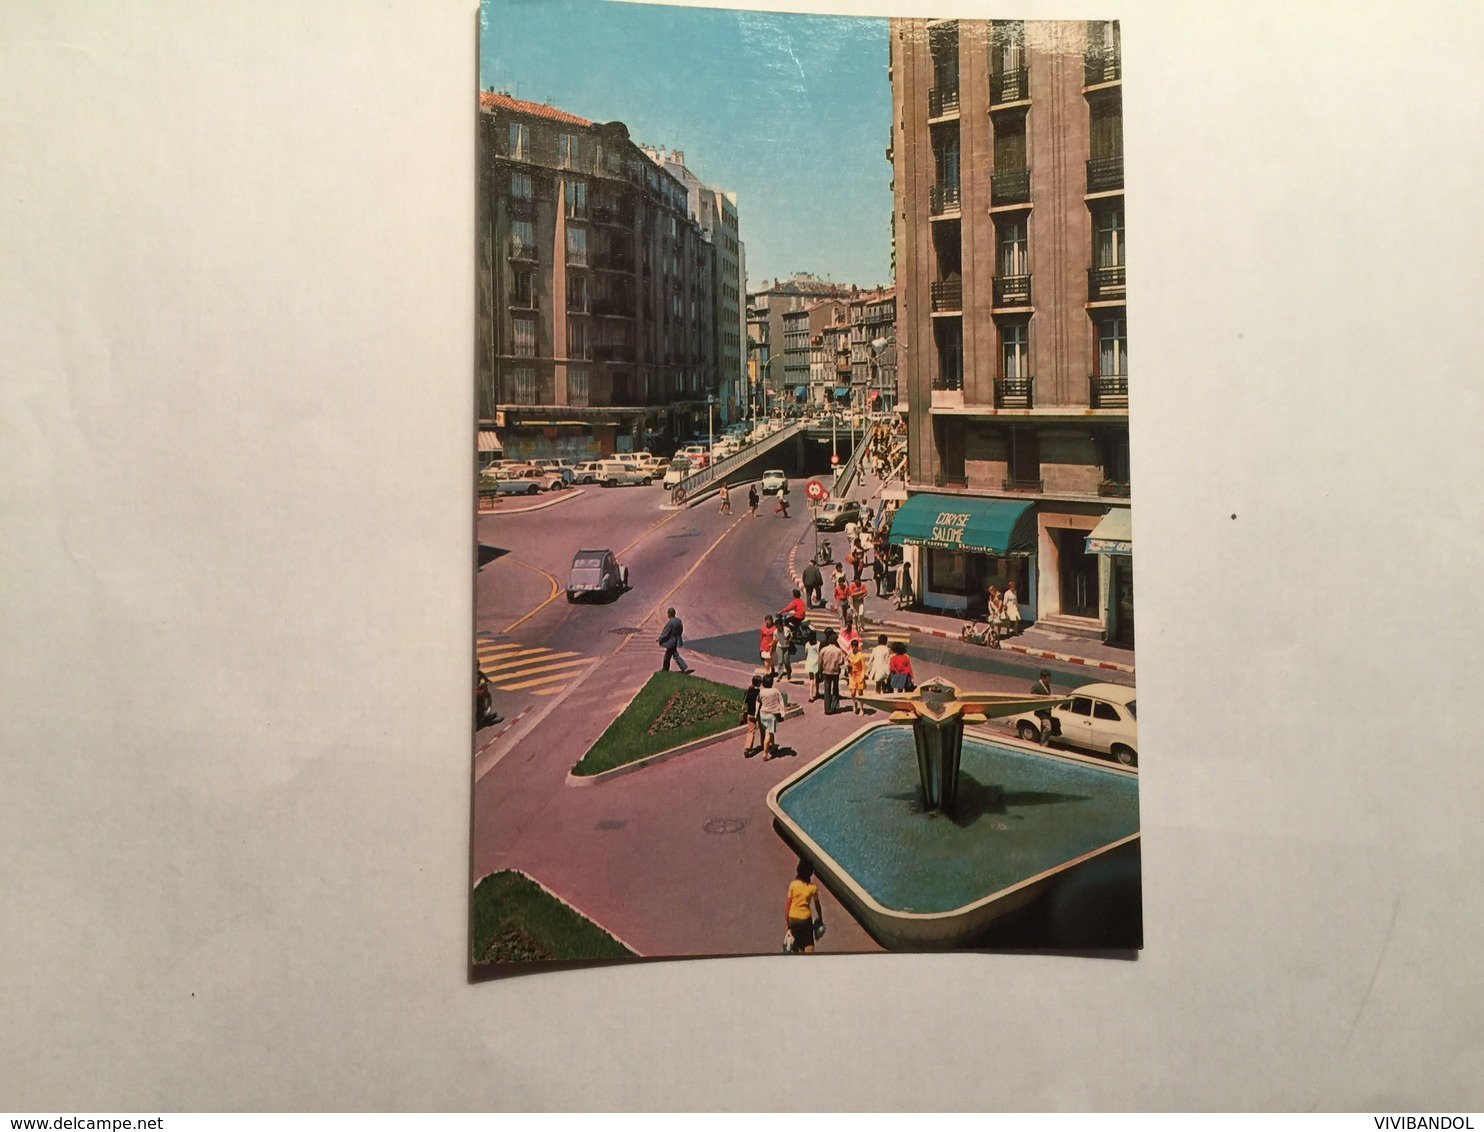 Marseille Centre - Cinq Avenues, Chave, Blancarde, Chutes Lavies